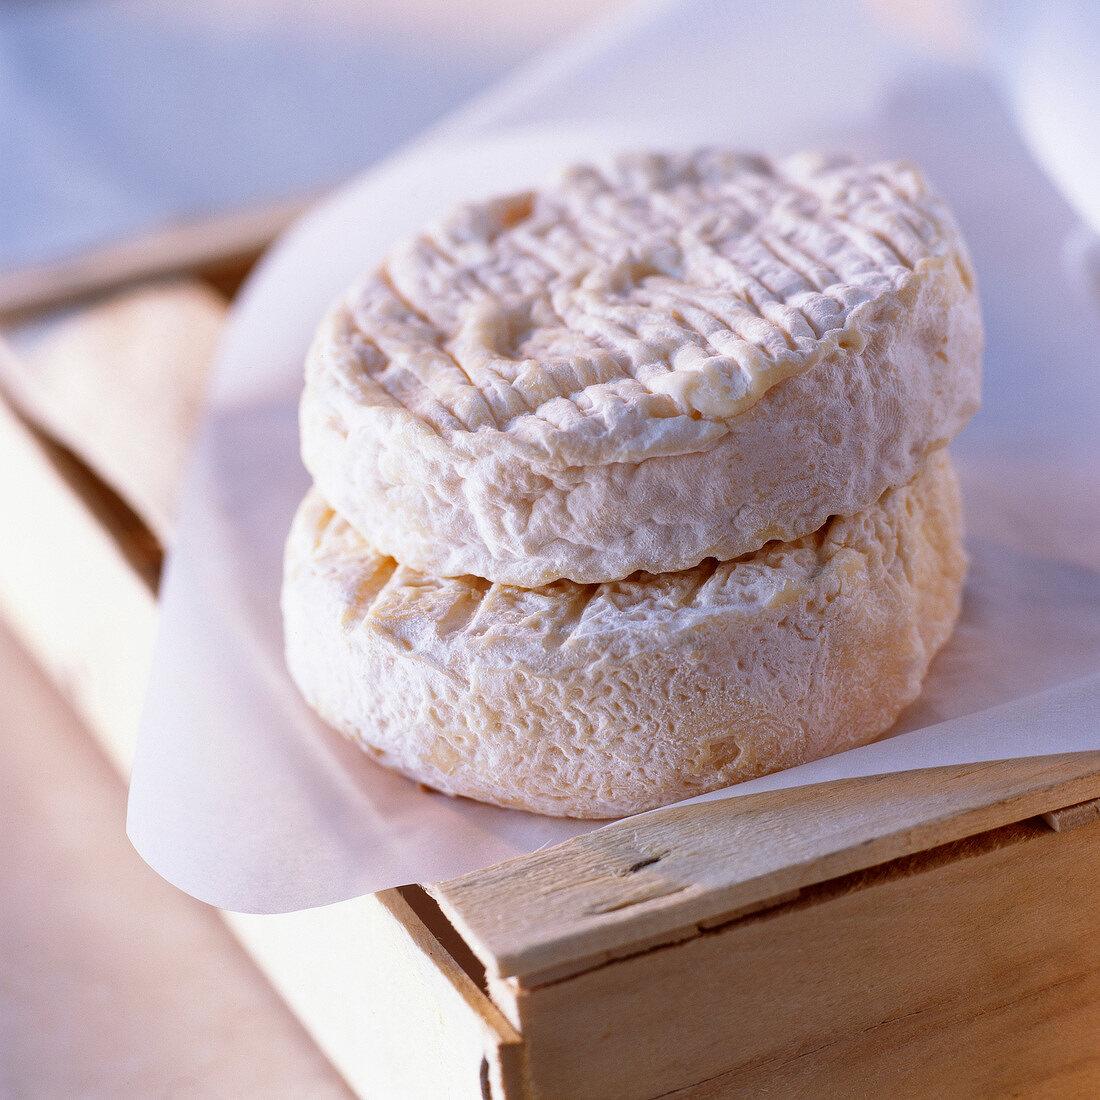 Saint-Félicien cheeses